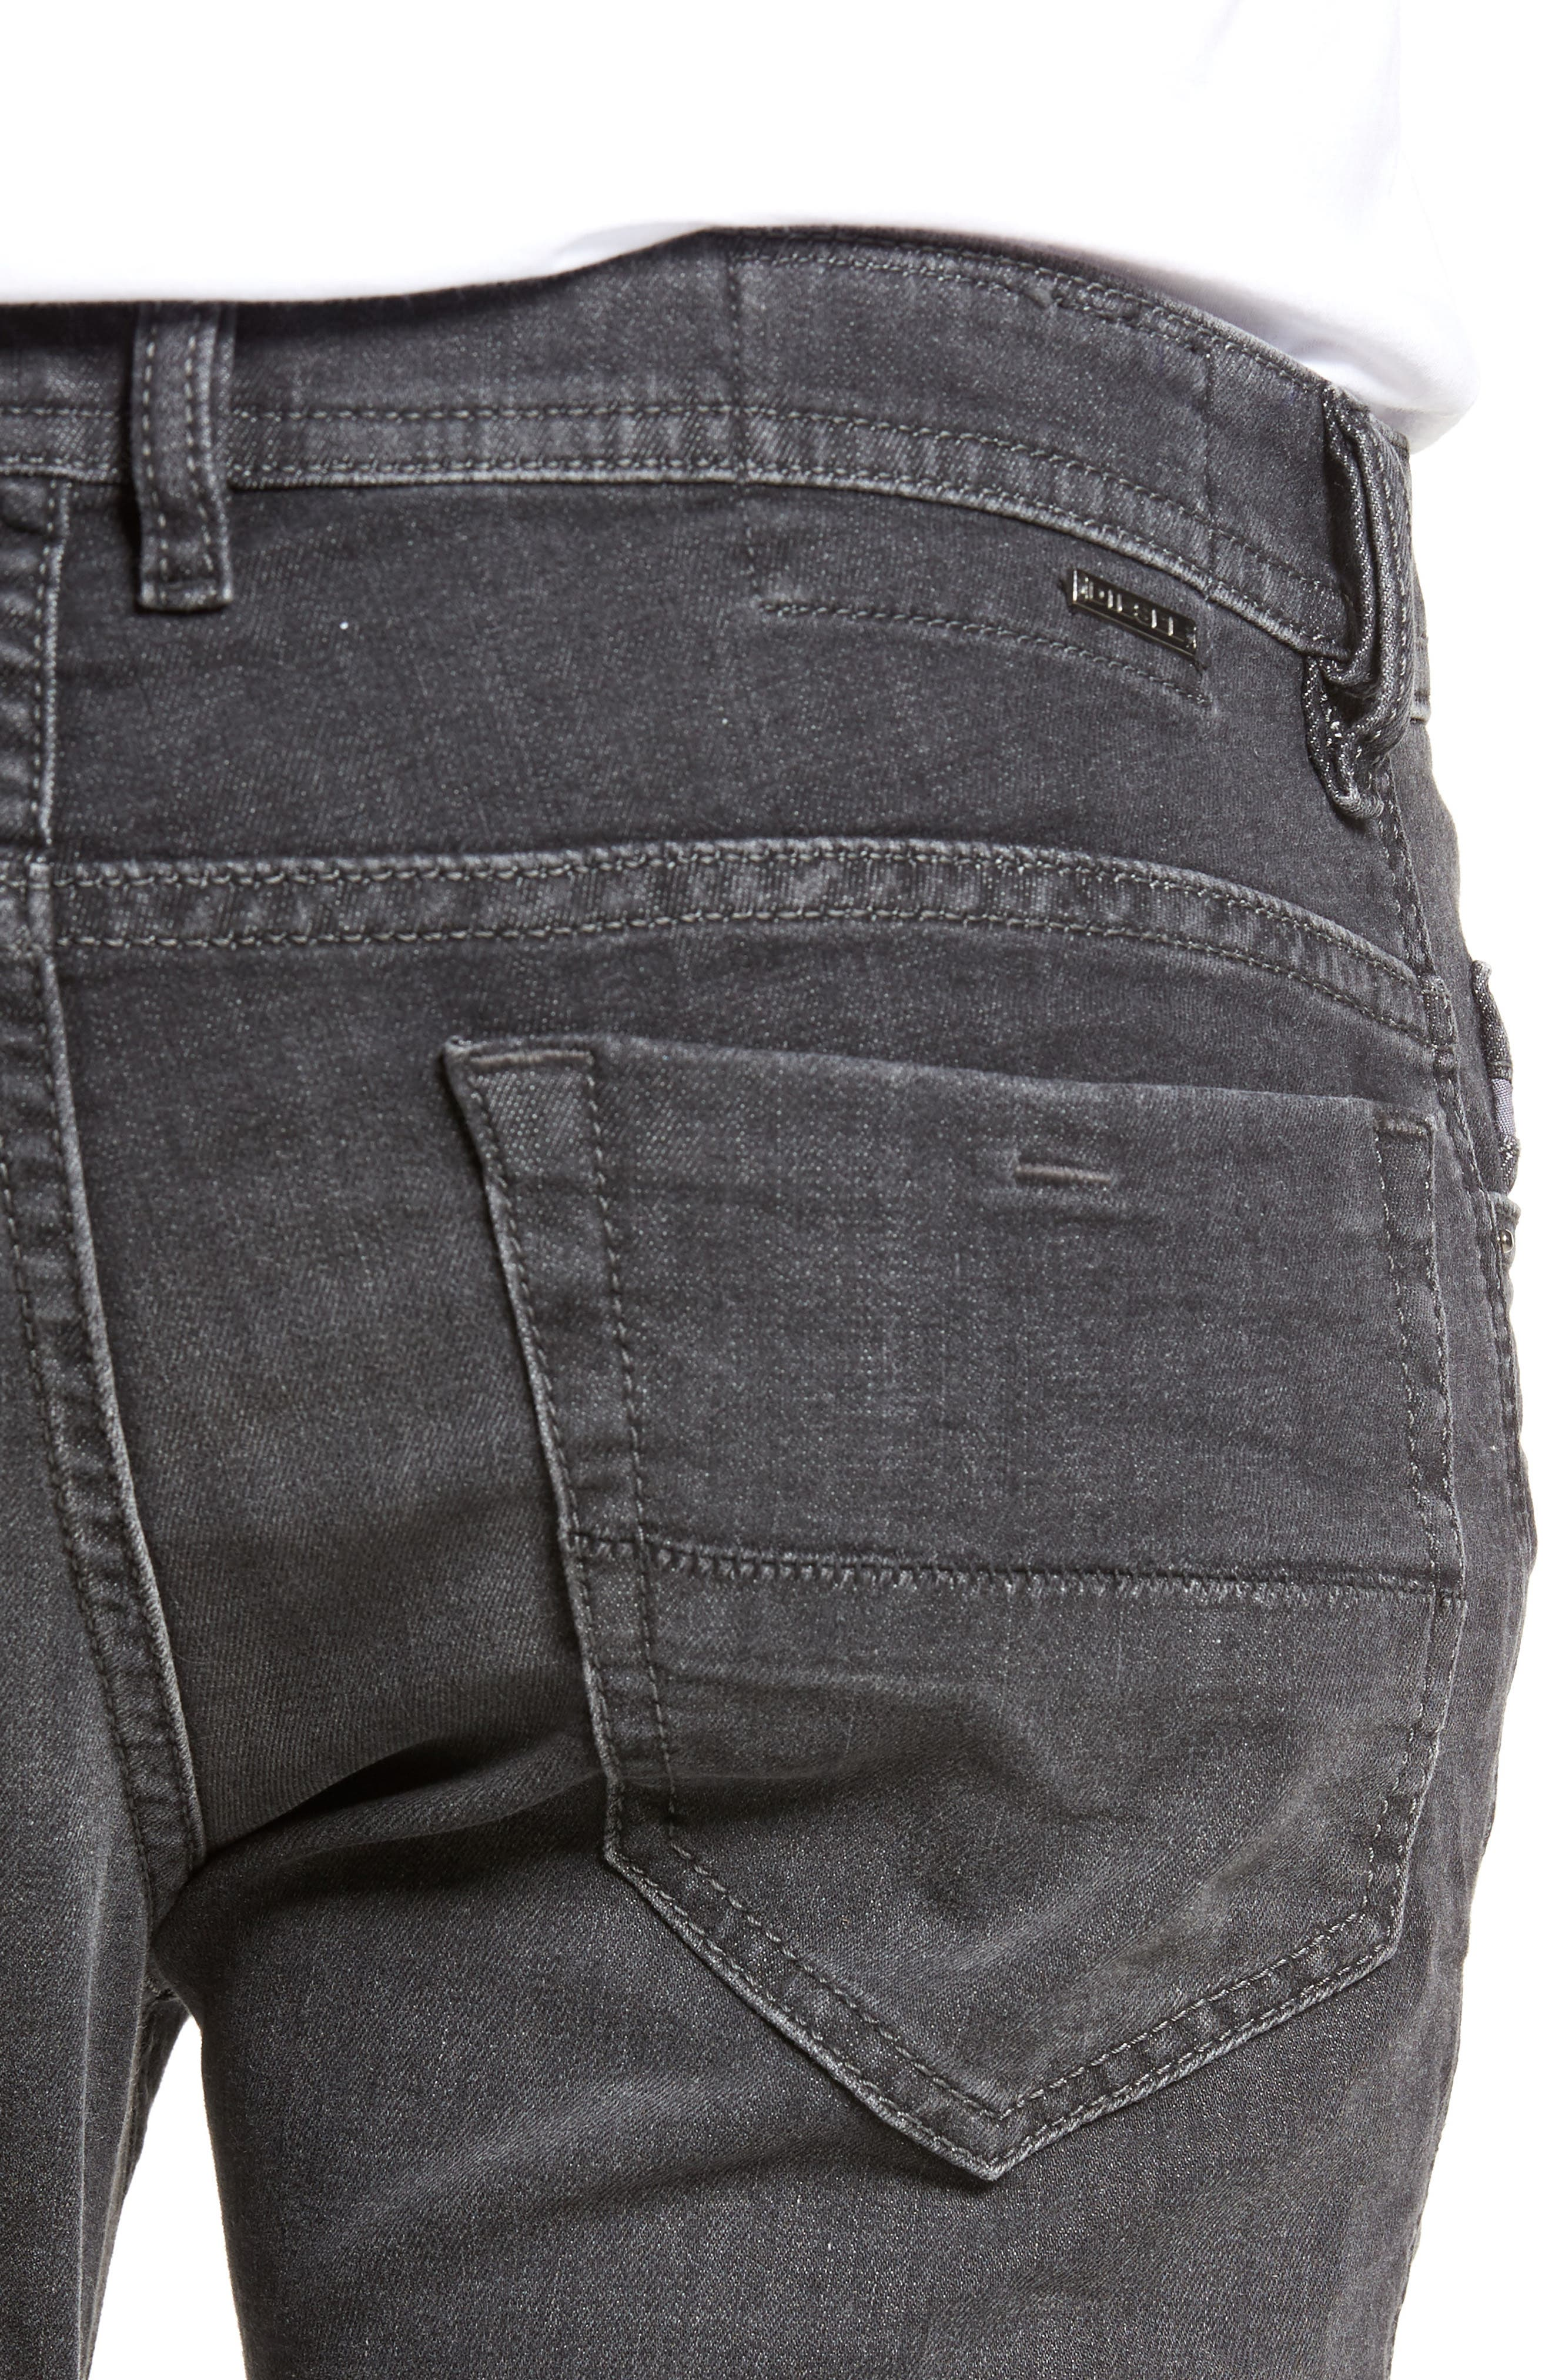 Thommer Slim Fit Jeans,                             Alternate thumbnail 4, color,                             001